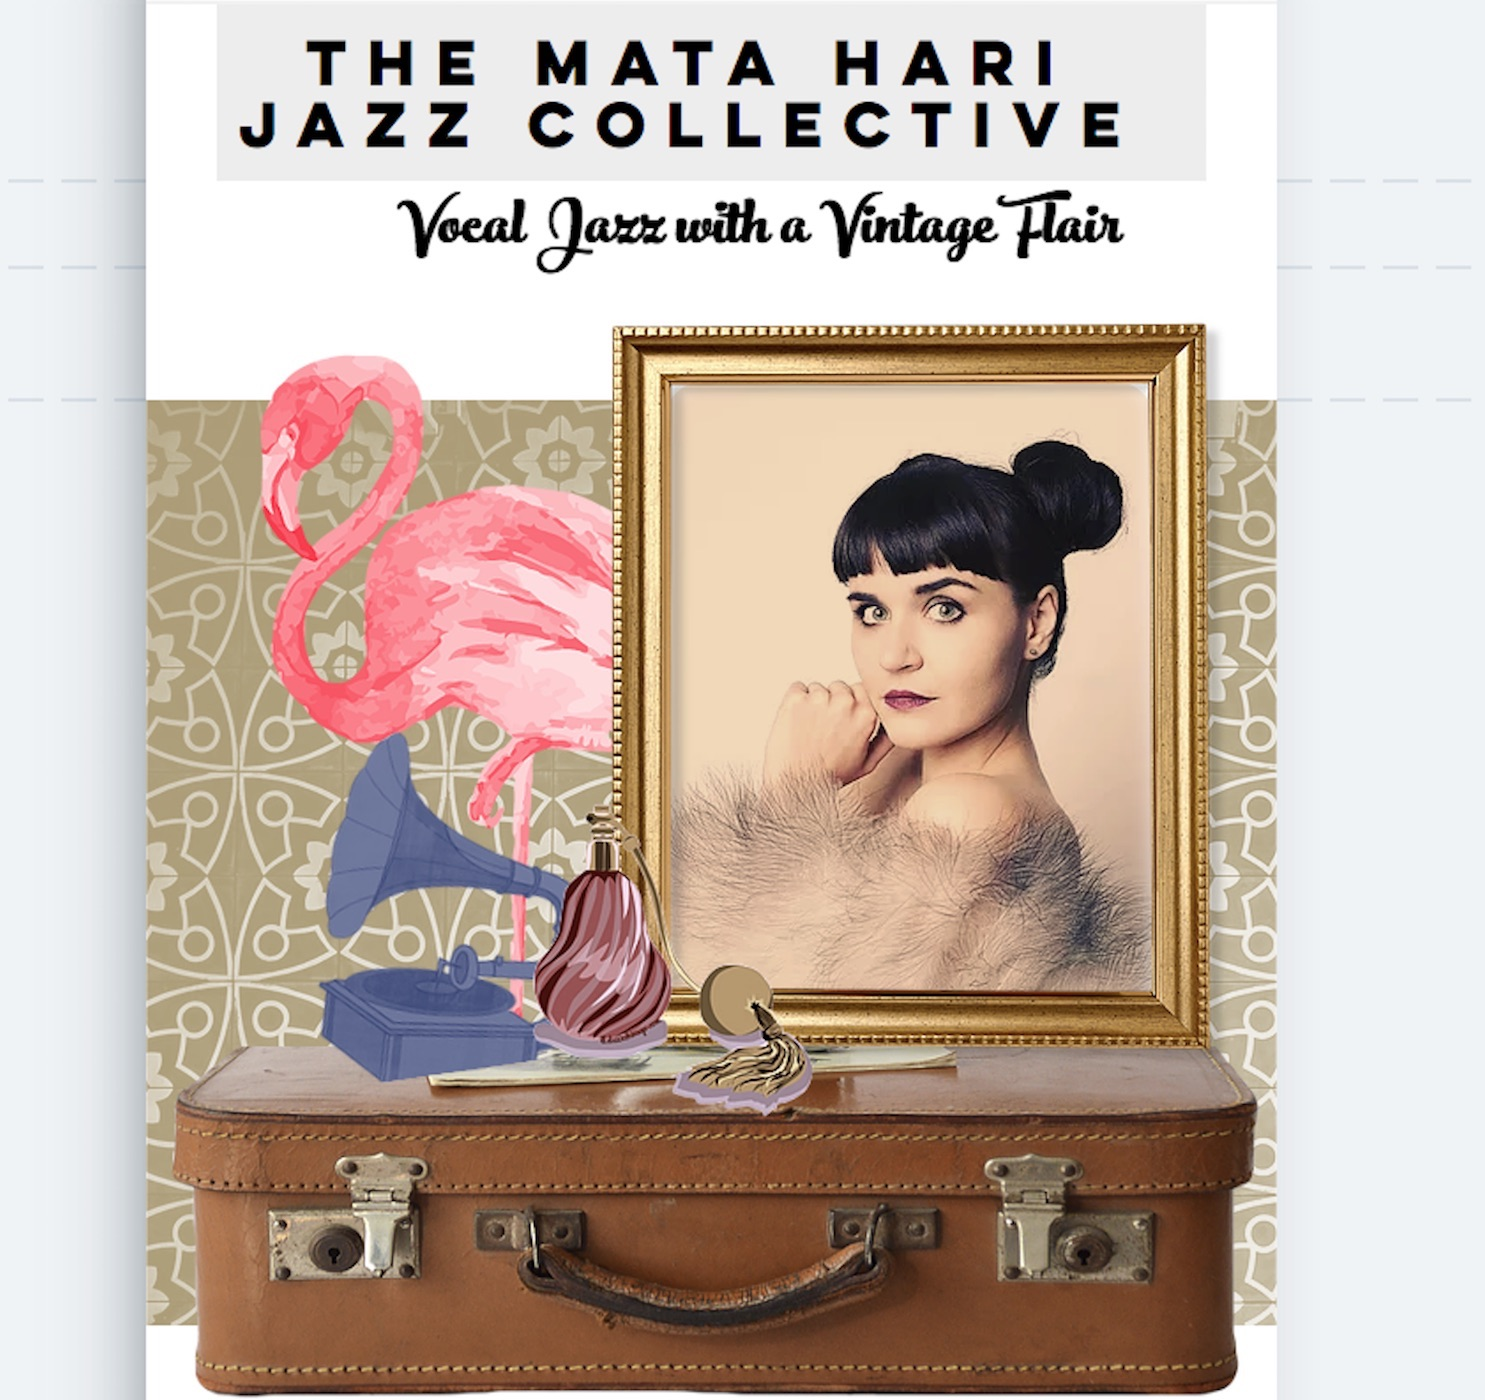 The Mata Hari Jazz Collective